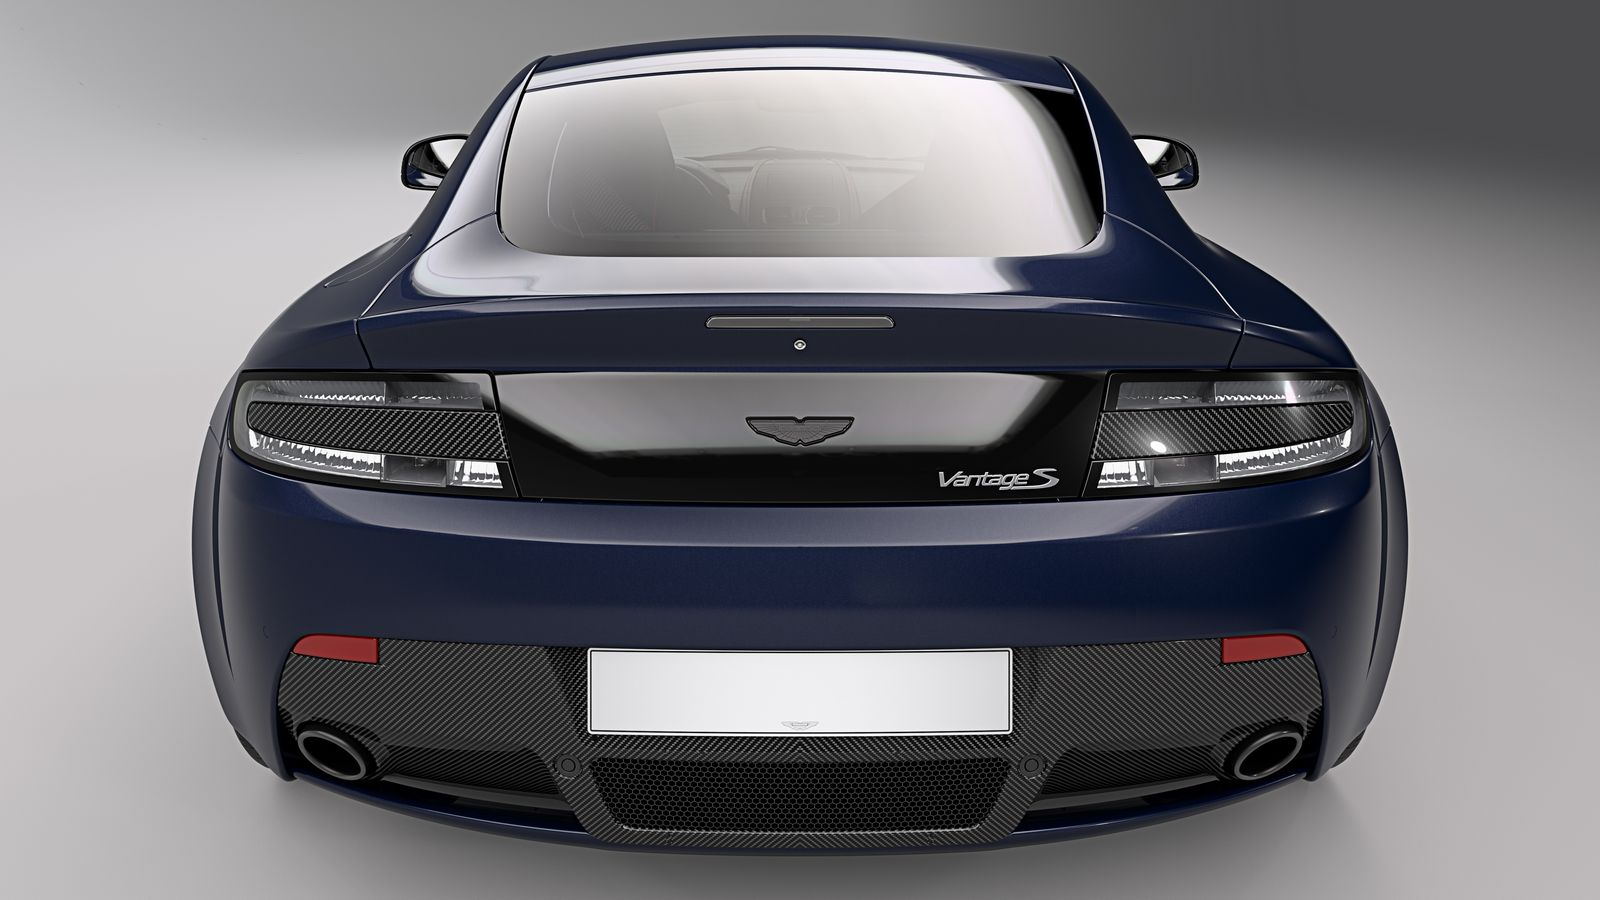 Aston Martin V8 and V12 Vantage Red Bull Racing Editions (7)